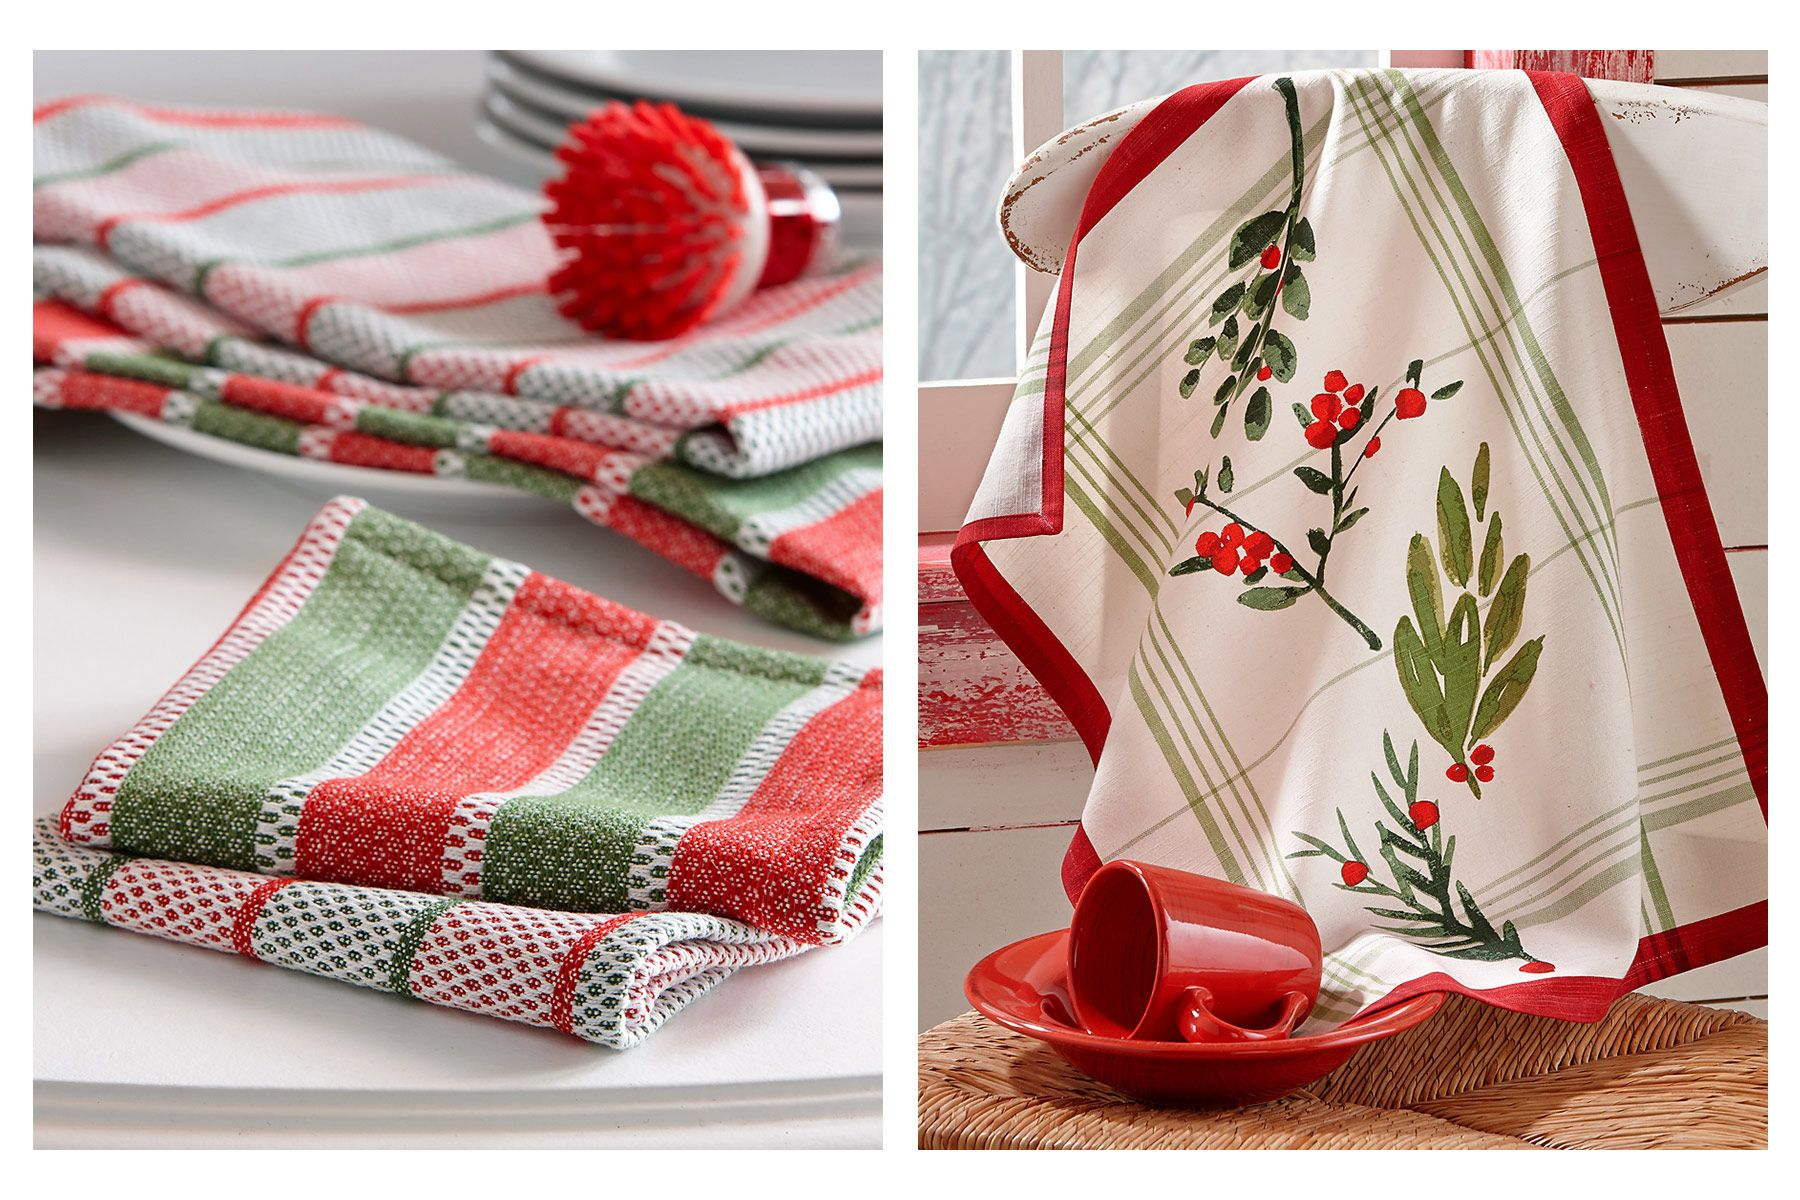 Textiles-2-Images.jpg